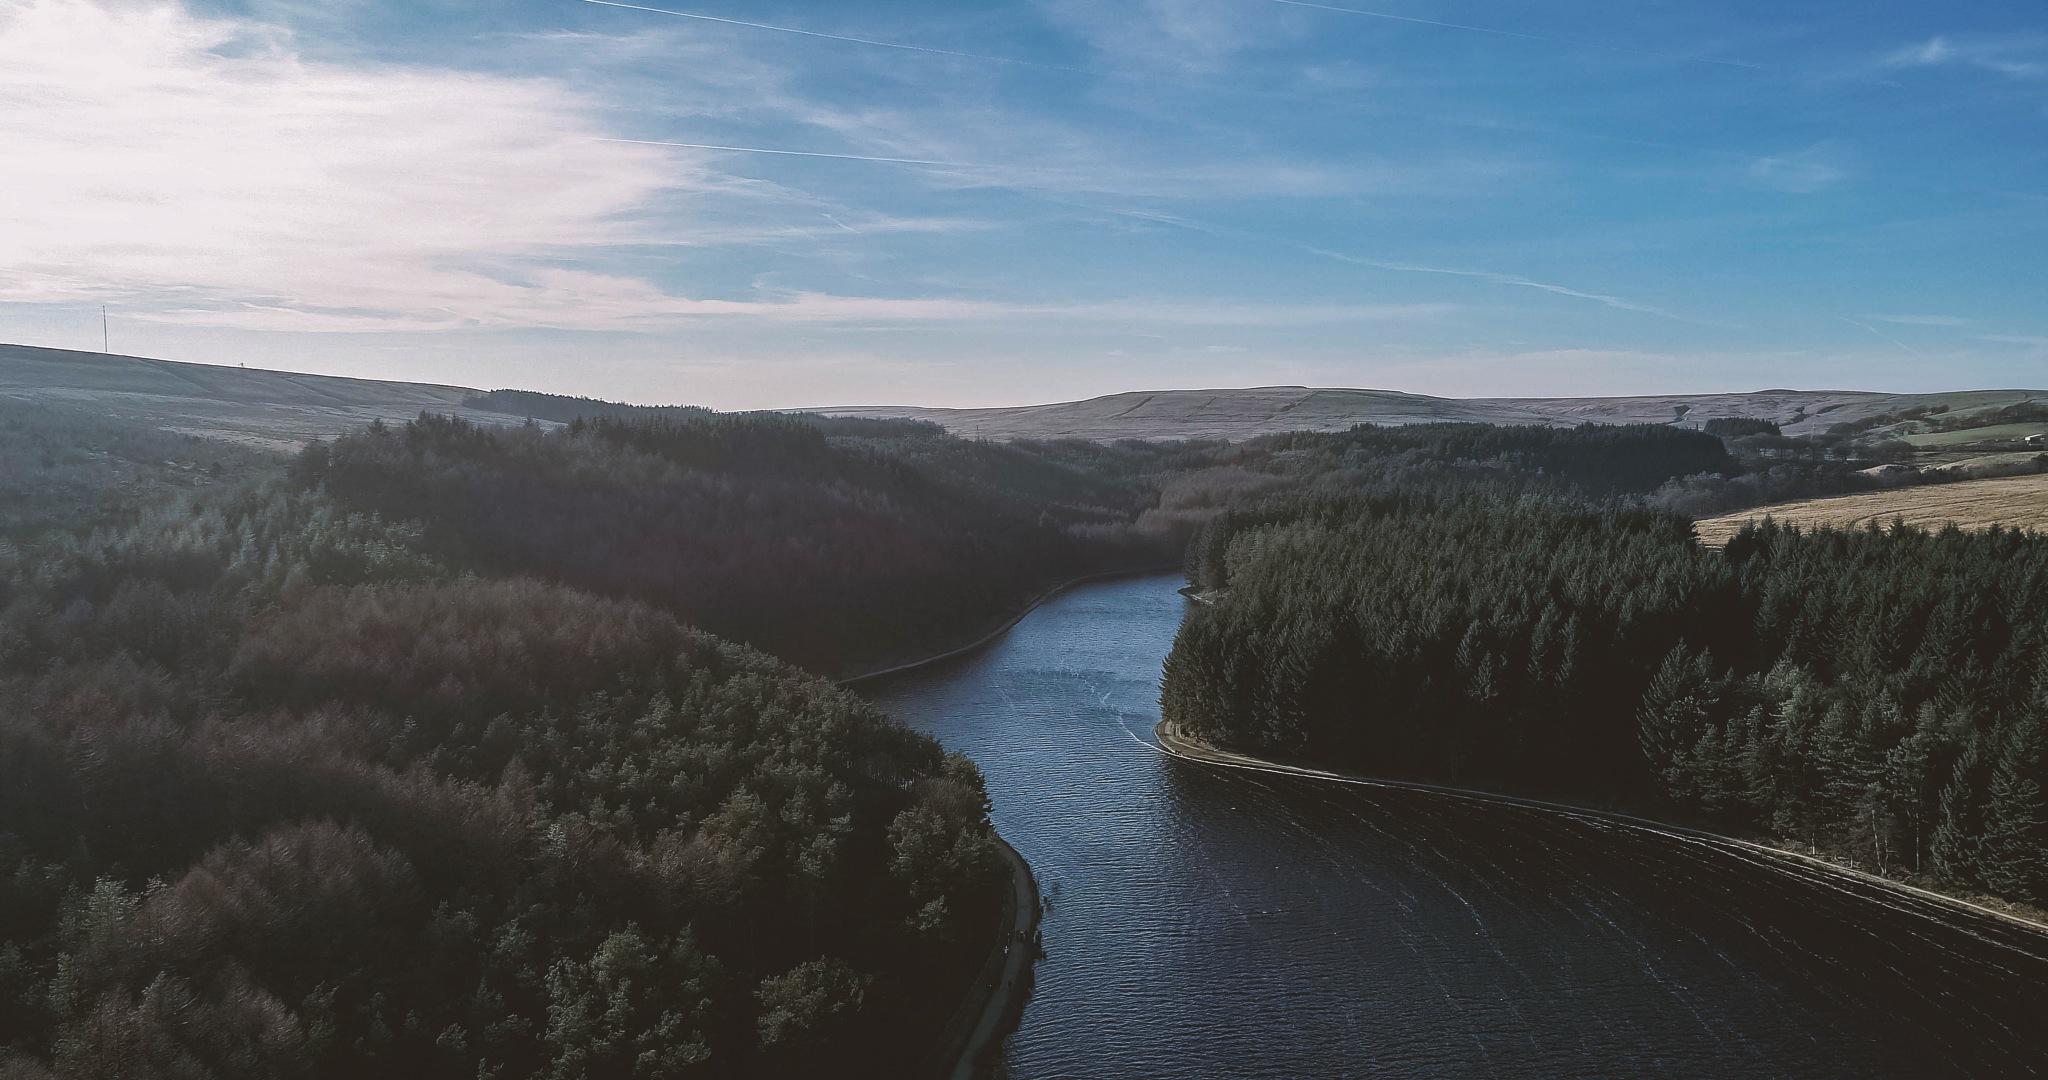 Water Run by Mic Bilsborough